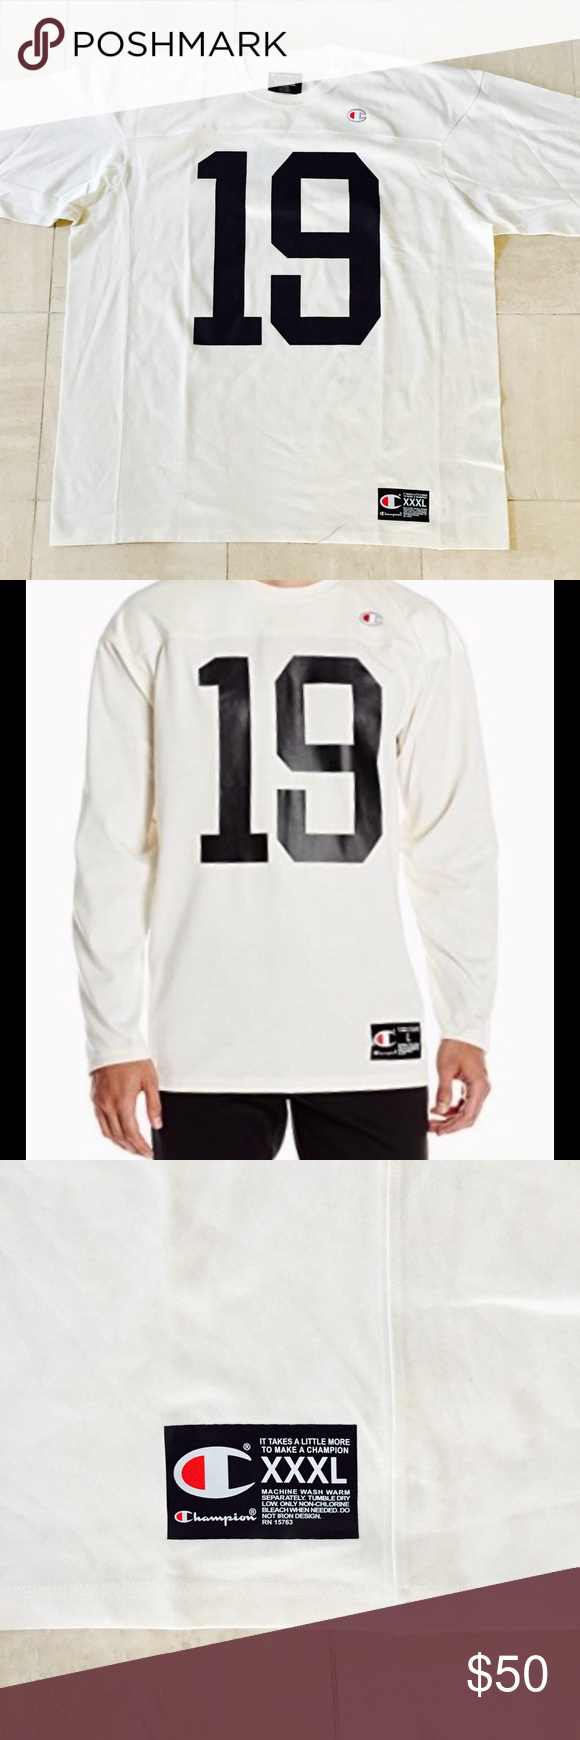 Tee Shirts · Life · Champion Life Men s Football Jersey Champion Life Men s  Football Jersey  Never worn e31af9eda